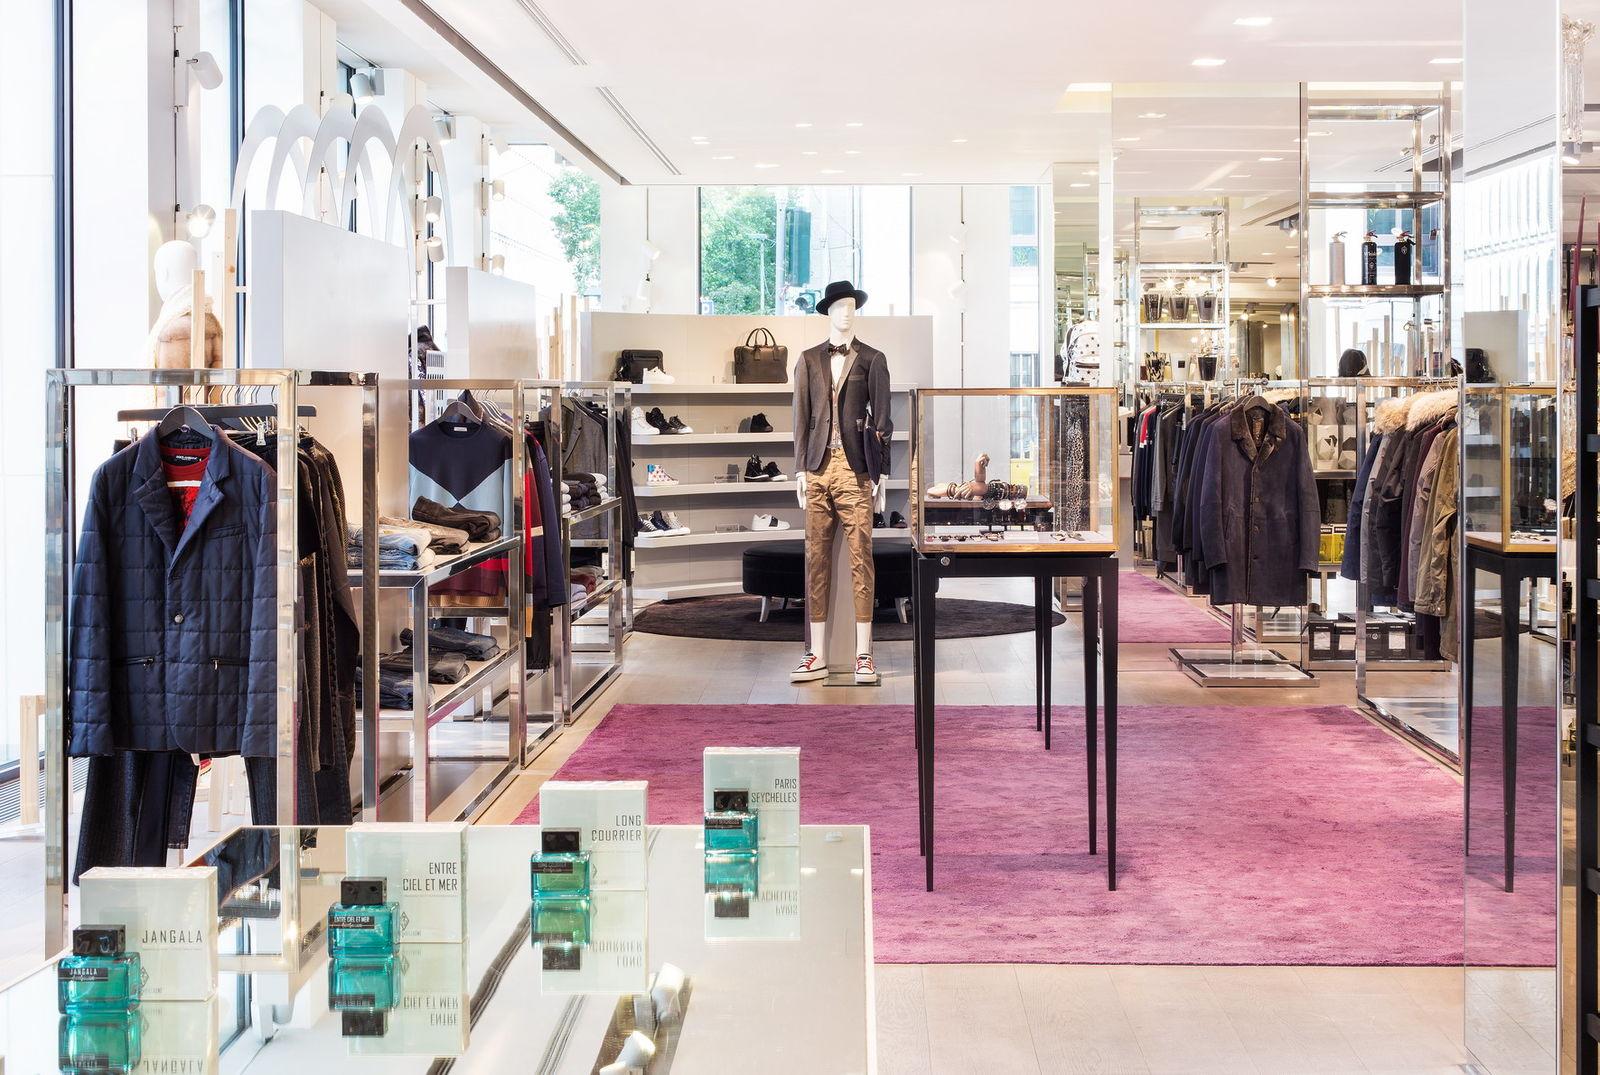 APROPOS The Concept Store in Düsseldorf (Bild 8)